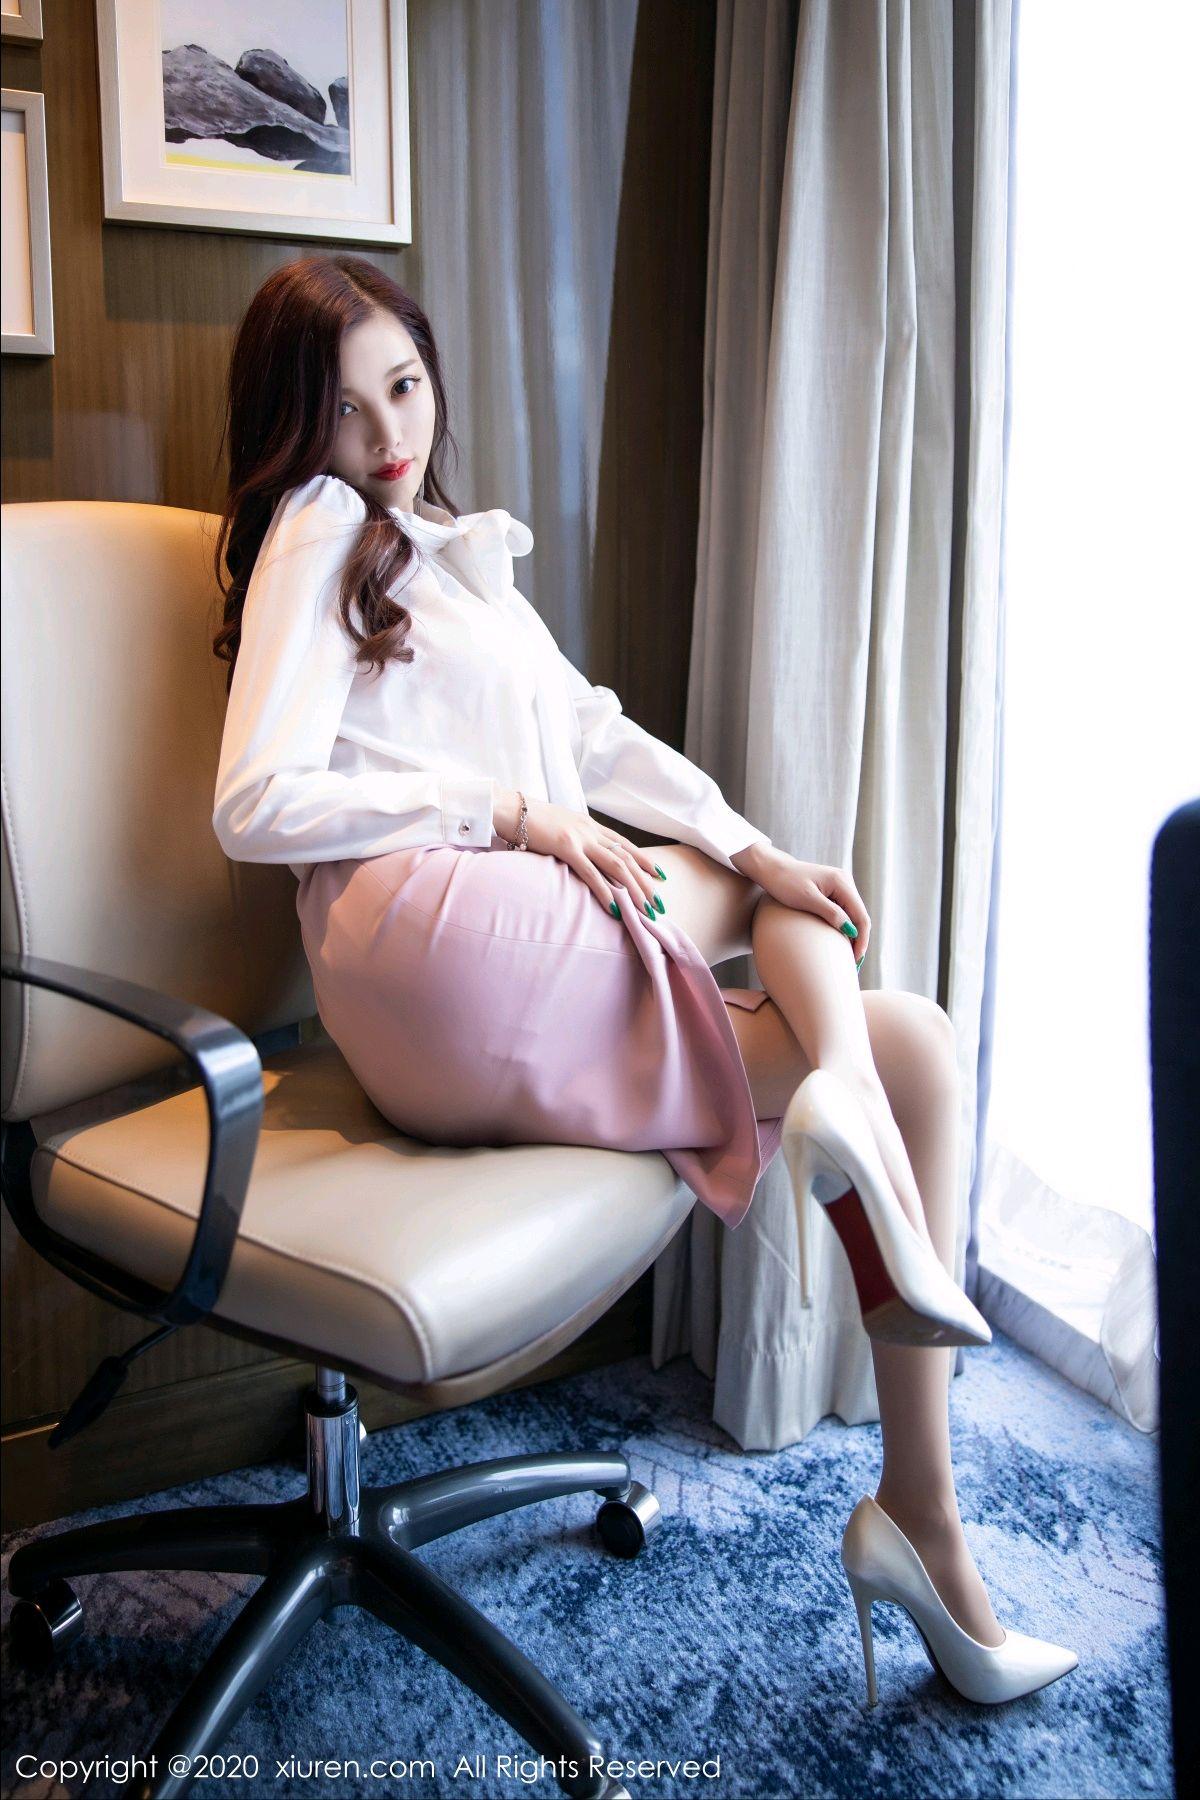 [XiuRen] Vol.2431 Yang Chen Chen 46P, Tall, Underwear, Uniform, Xiuren, Yang Chen Chen